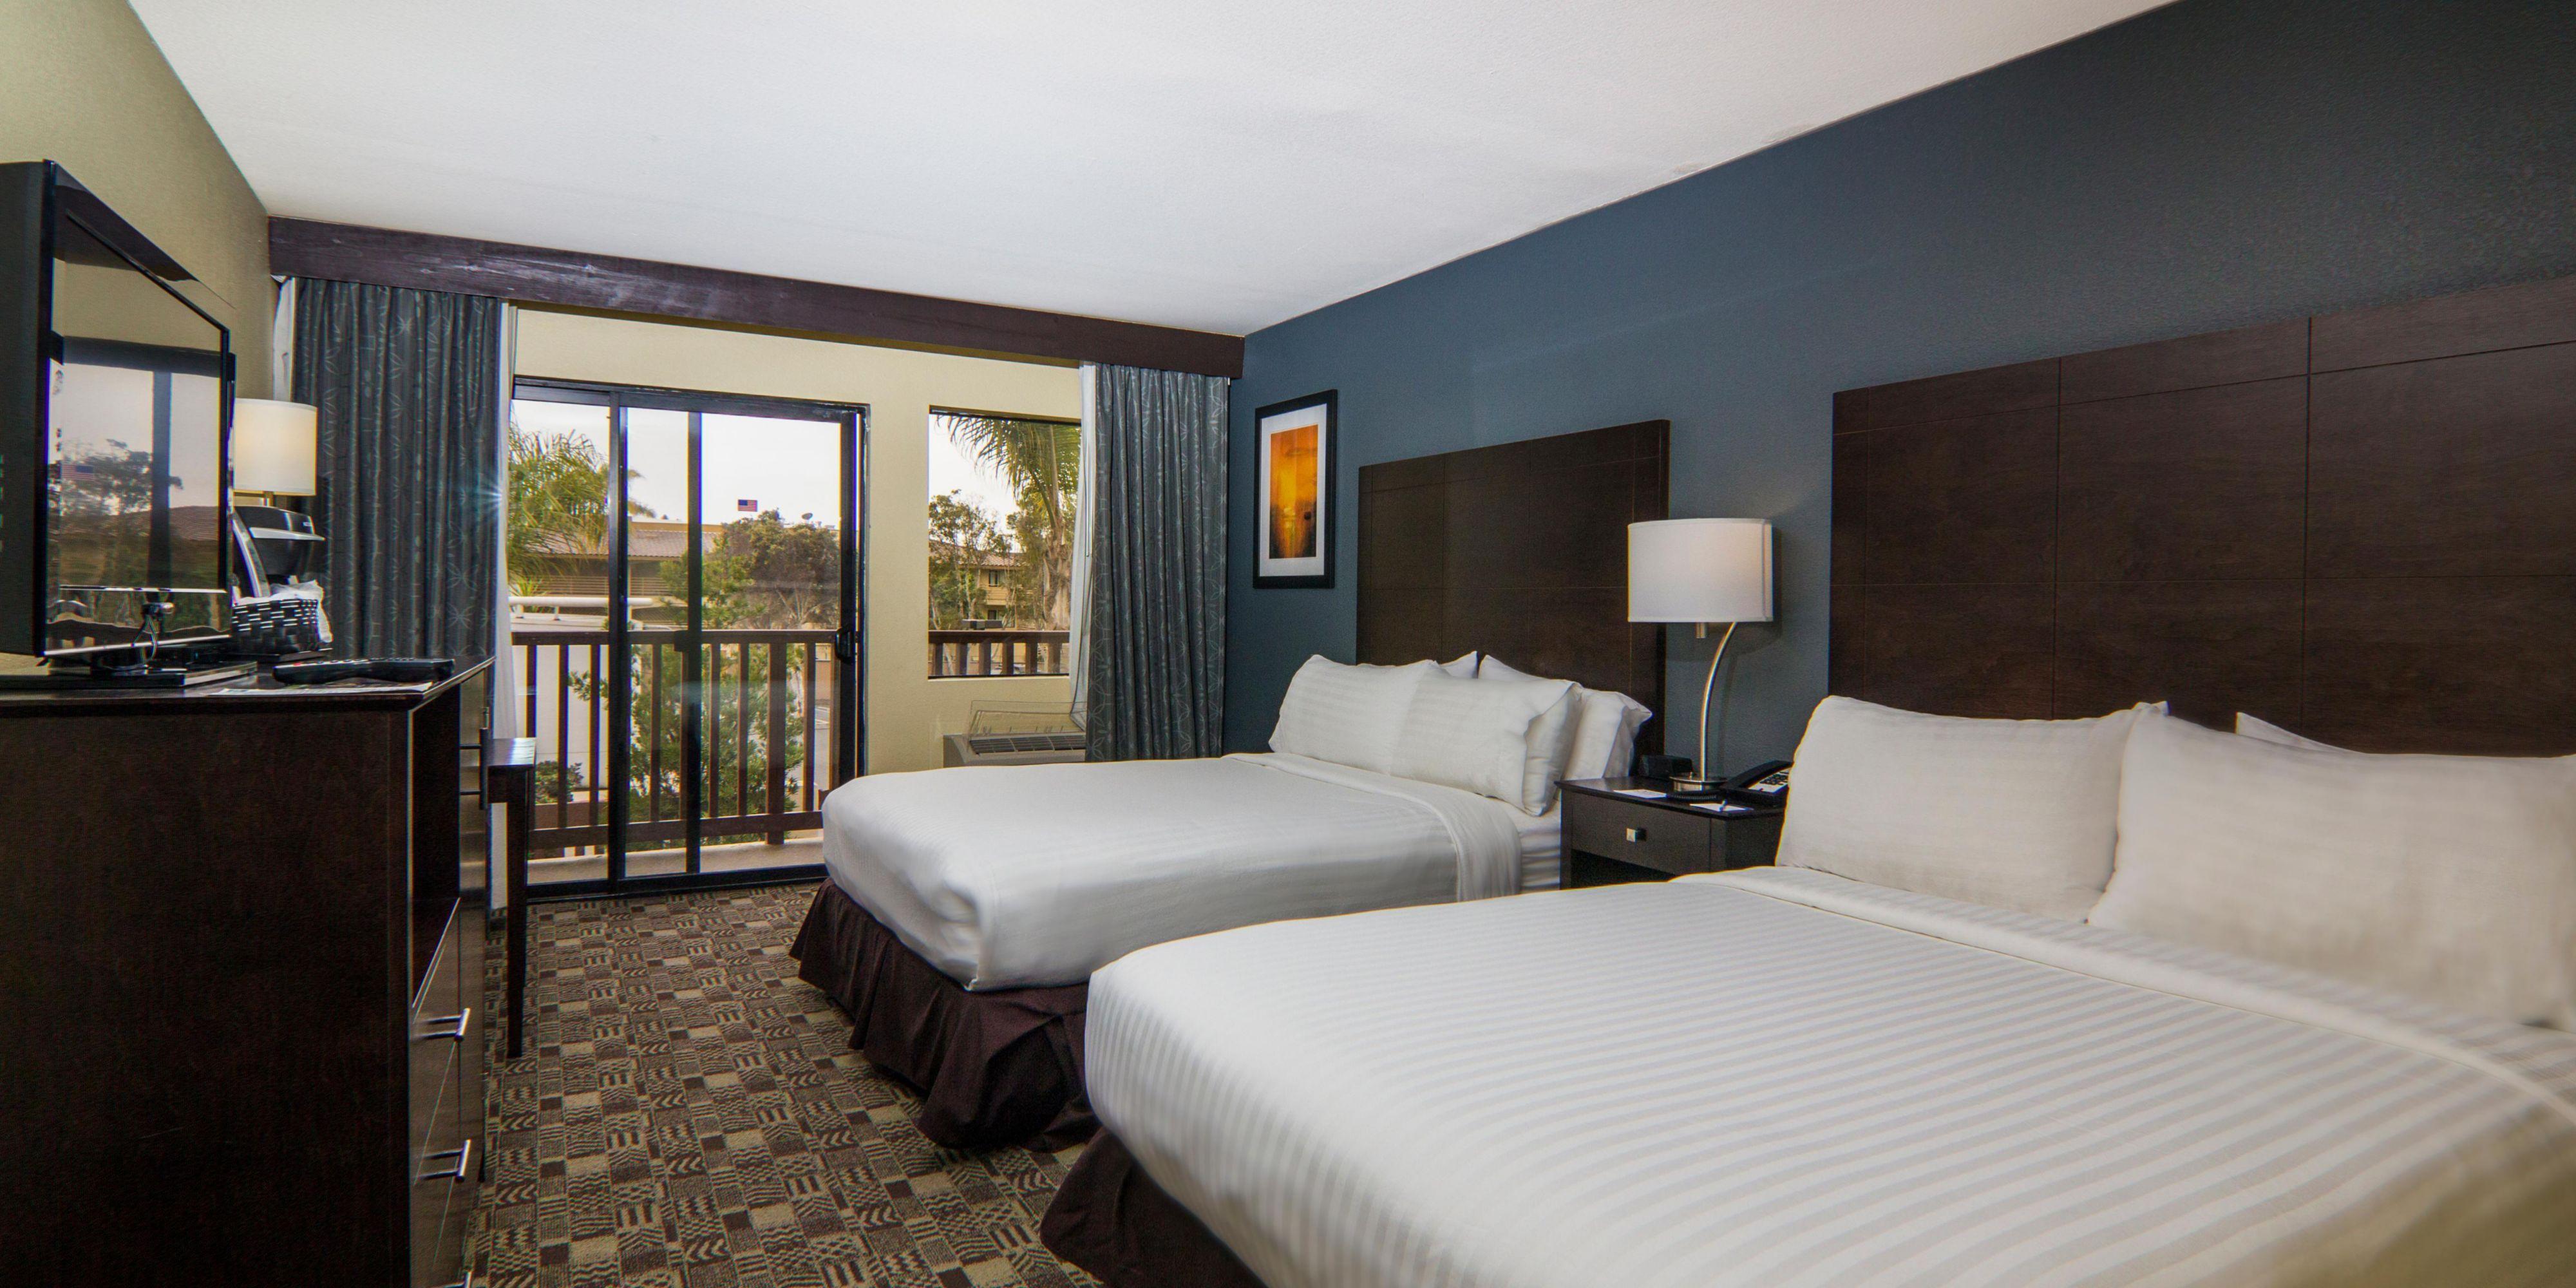 Solana Beach Hotels Holiday Inn Express Suites Solana Beach Del Mar